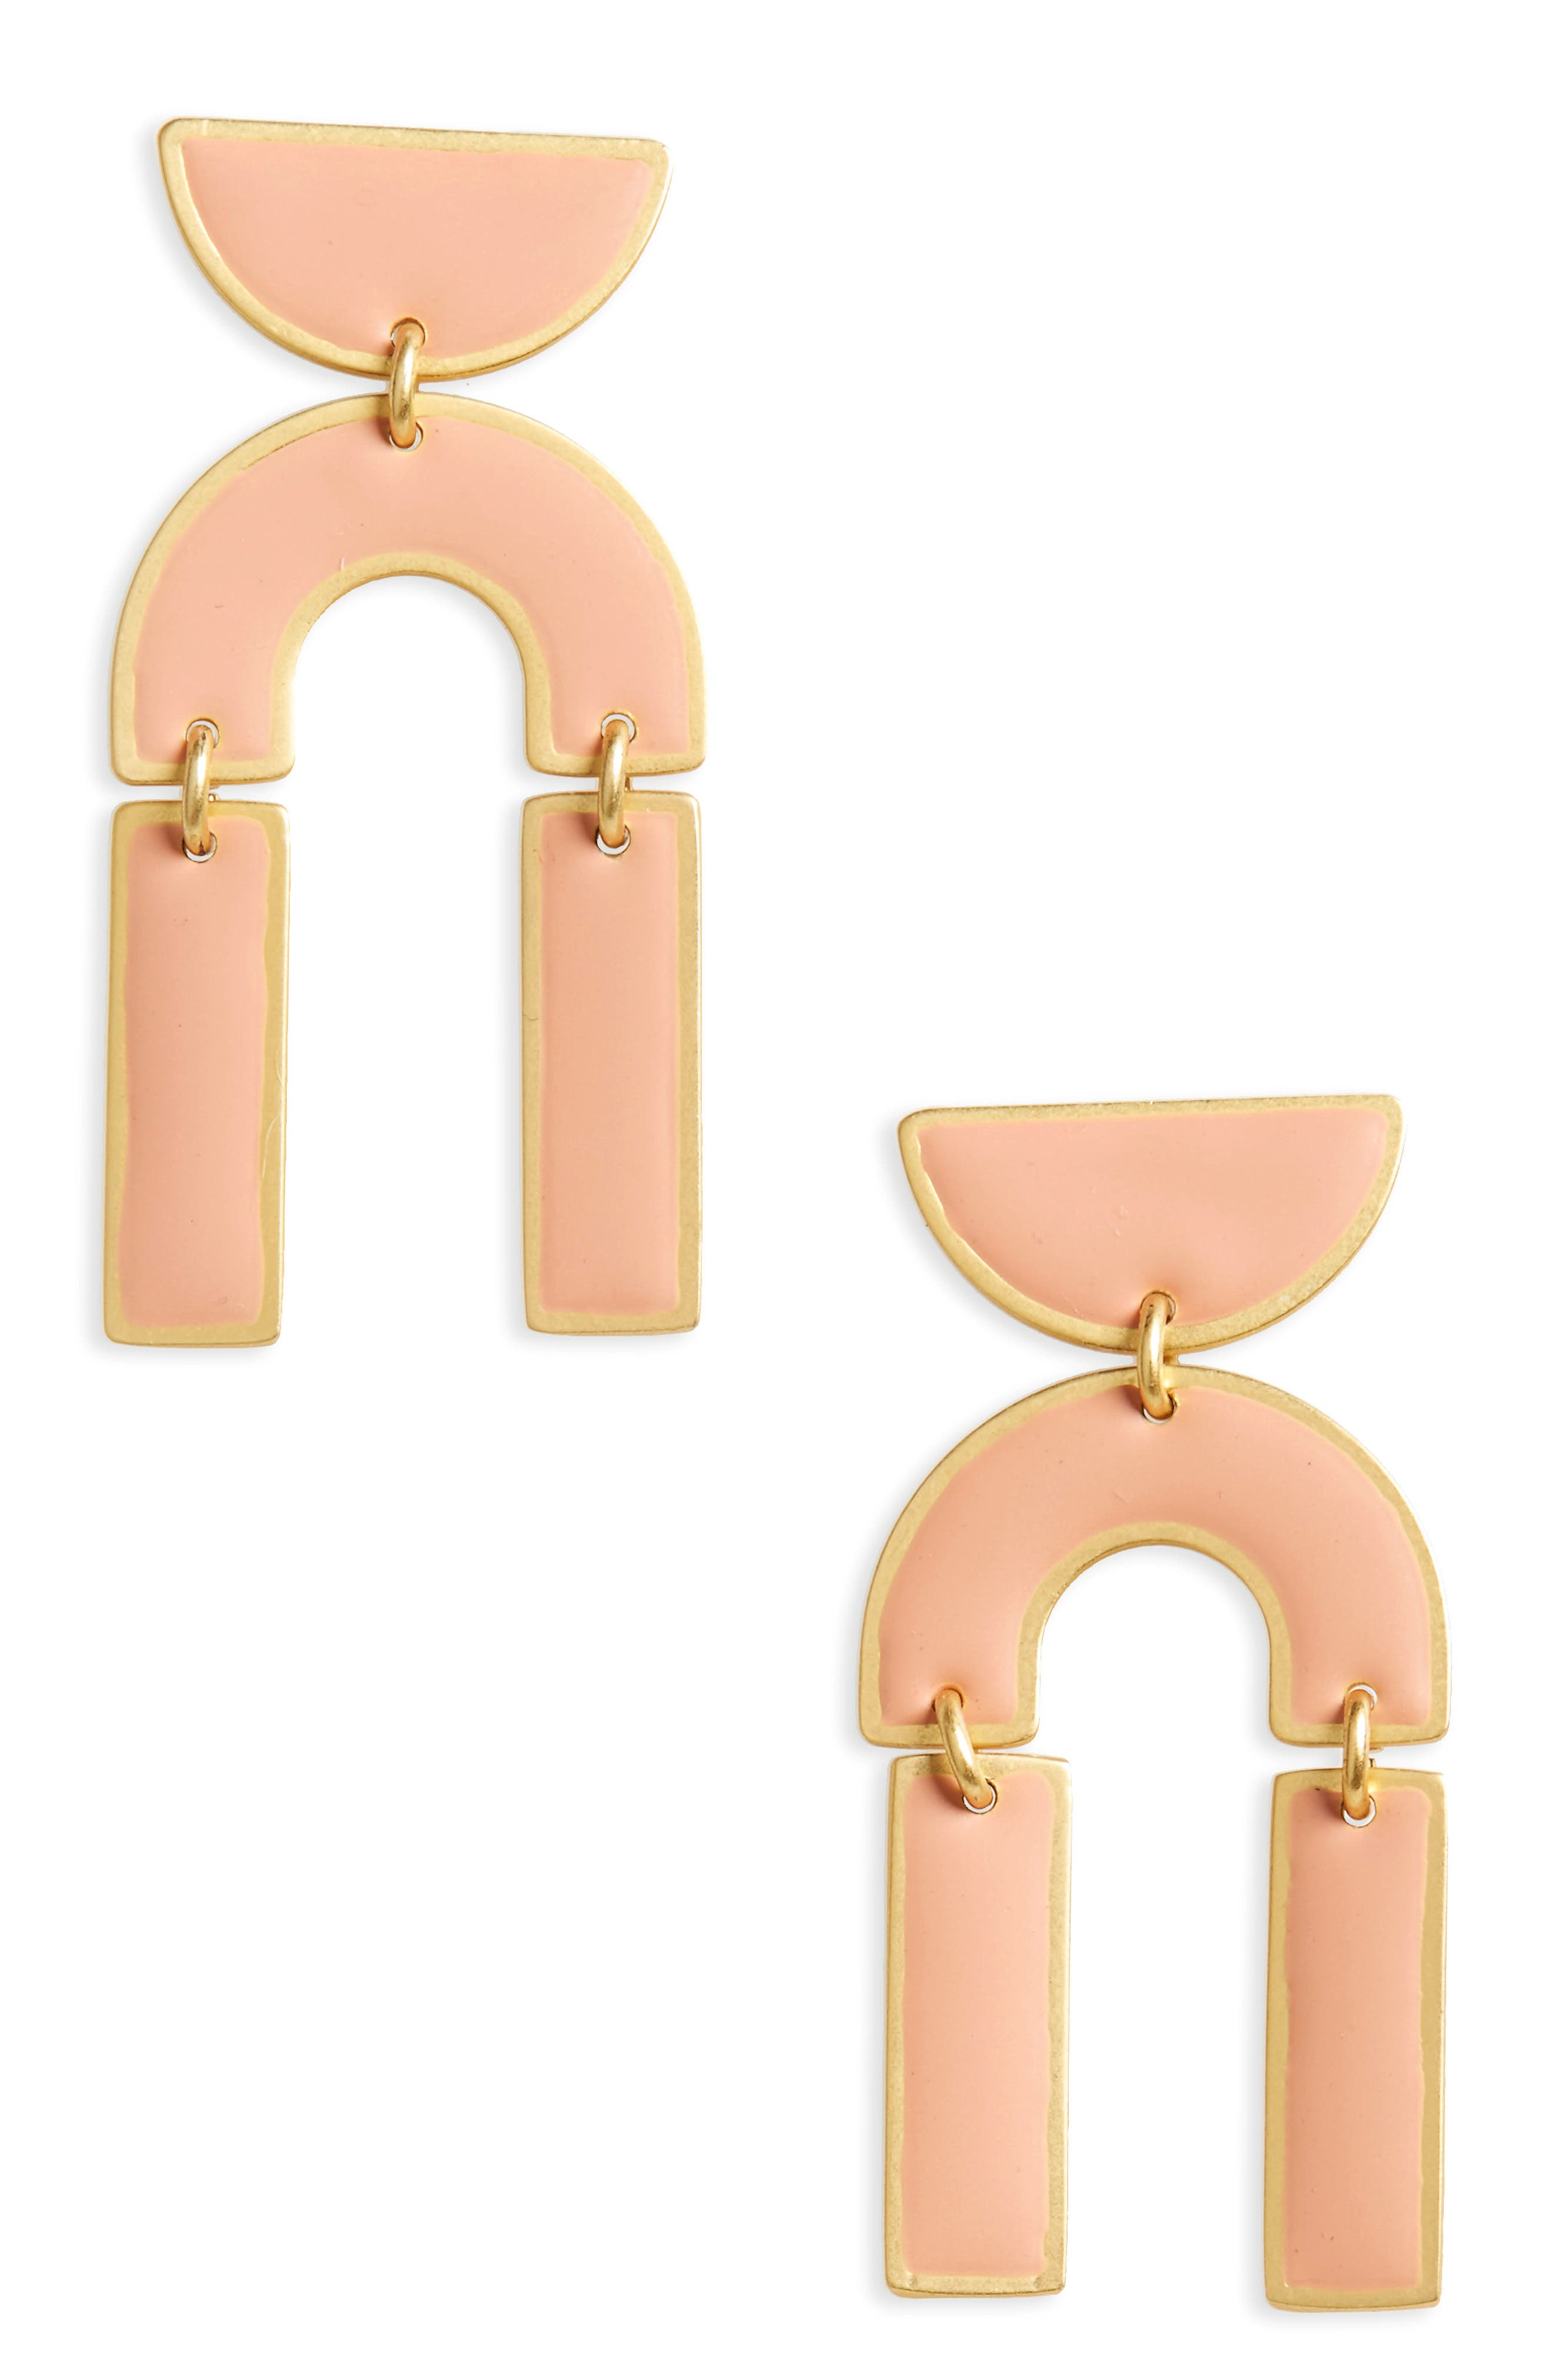 Modernism Half-Drop Earrings,                         Main,                         color, 710